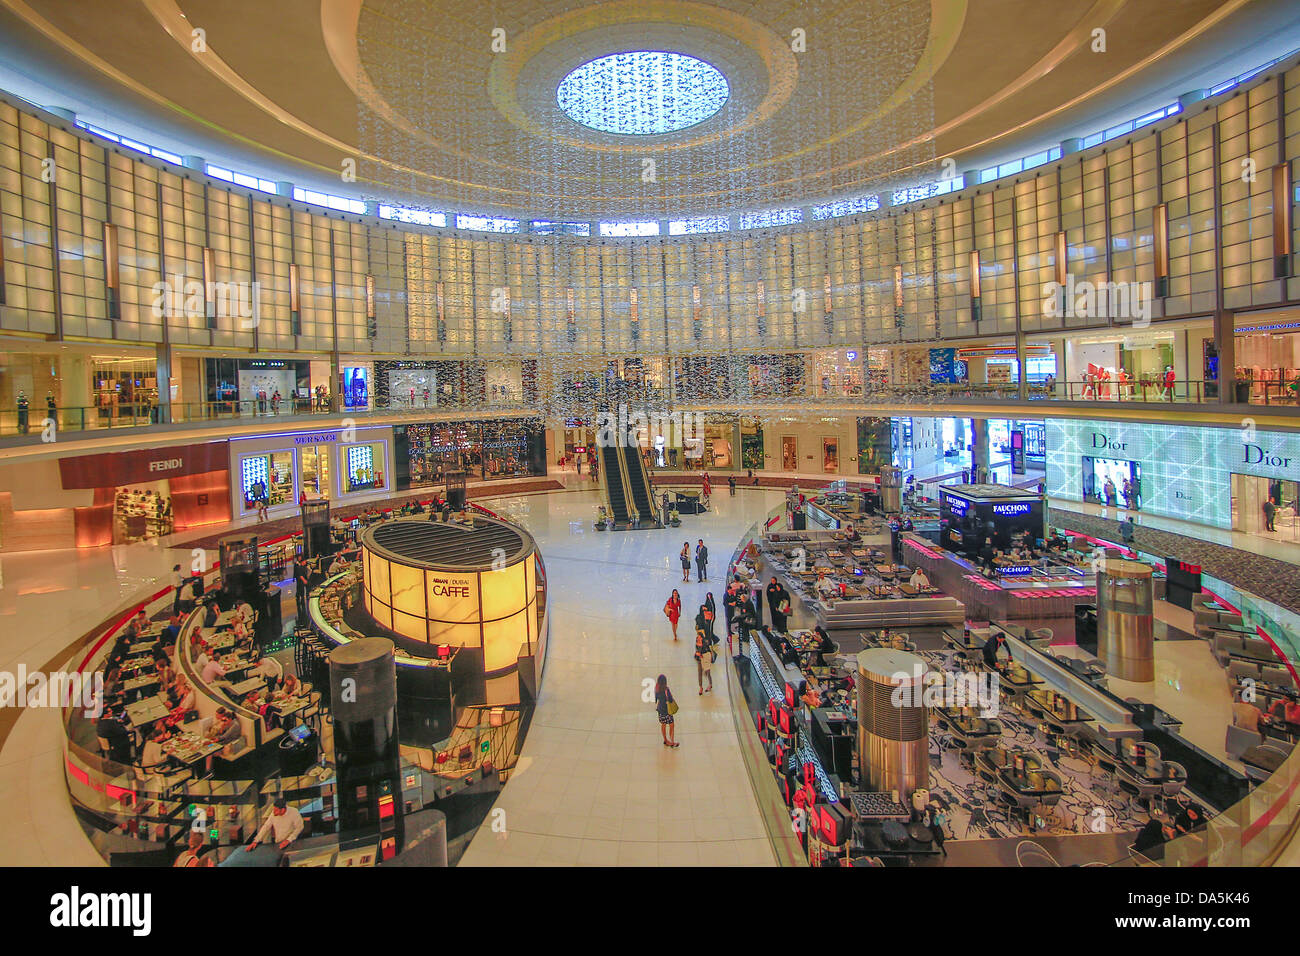 United Arab Emirates, UAE, Dubai, City, Mall, Dubai Mall, architecture, artistic, entrance, hall, huge, modern, - Stock Image